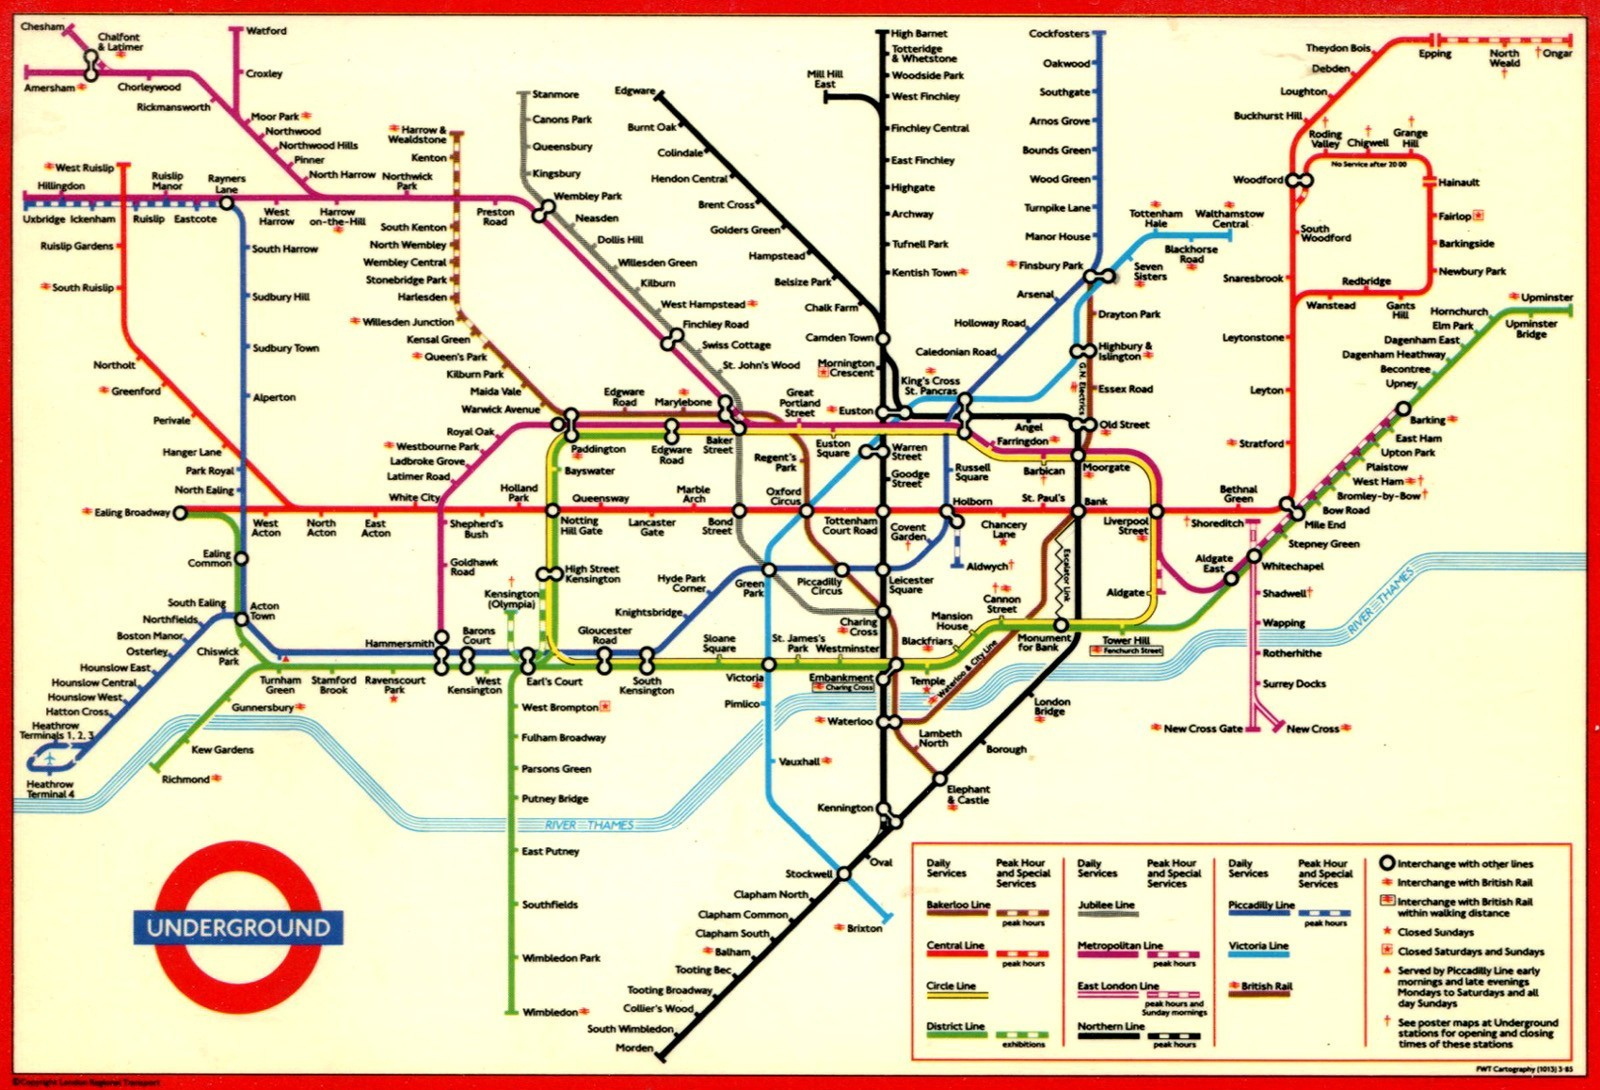 London Underground Map Printable   Globalsupportinitiative - London Tube Map Printable